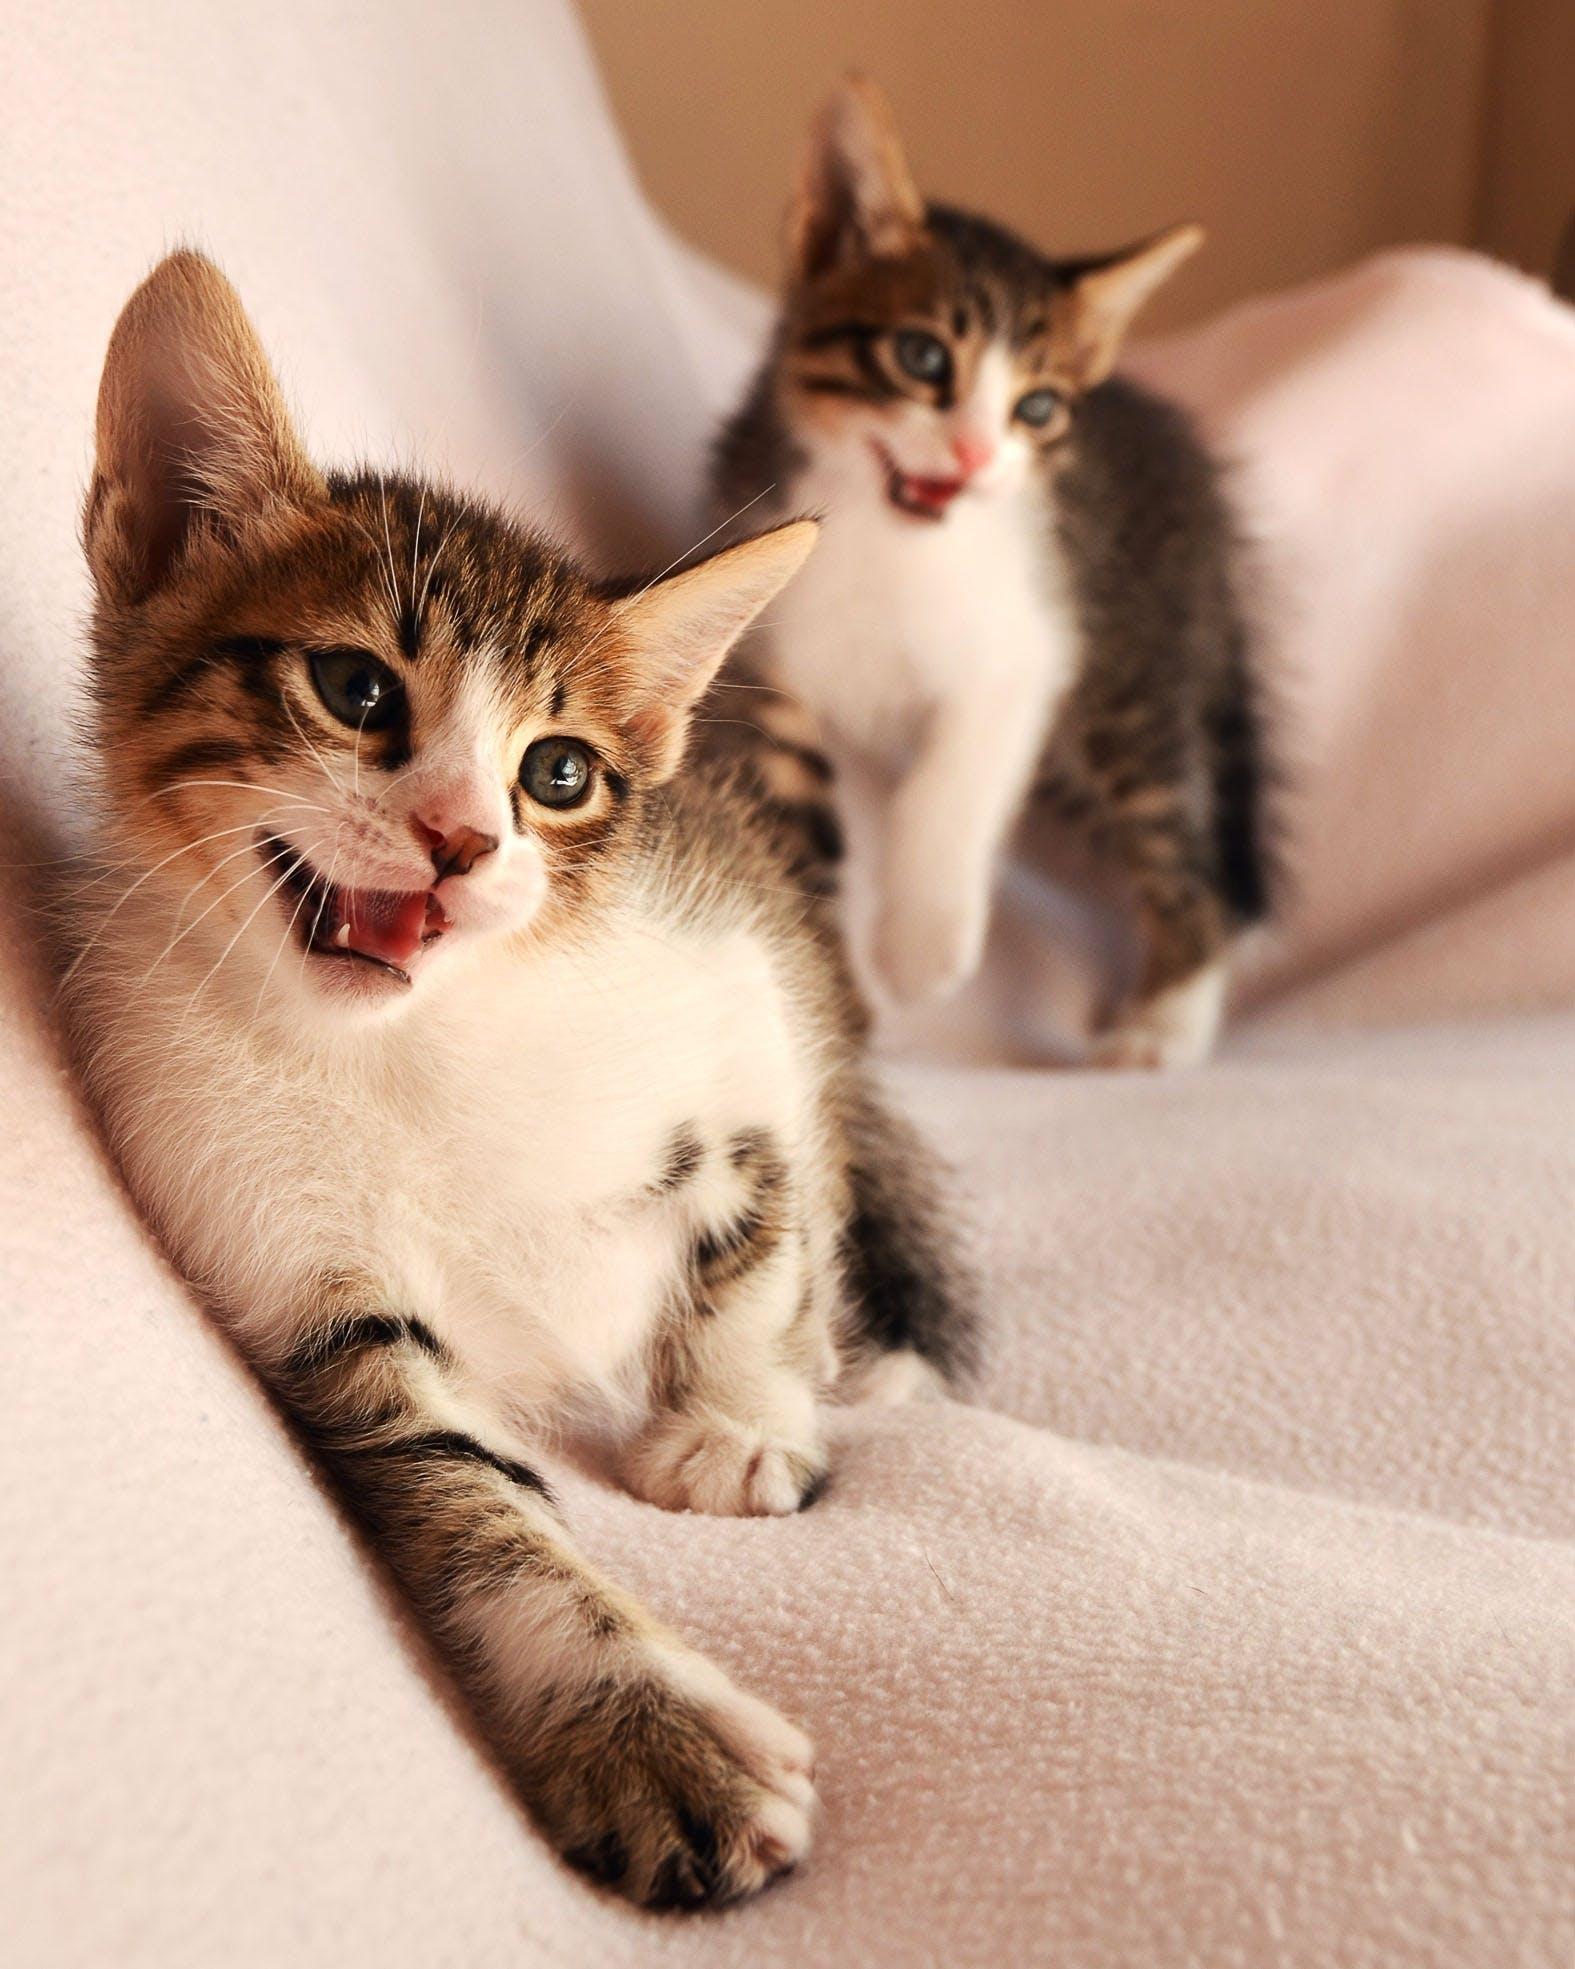 animals, cat face, cat's eyes